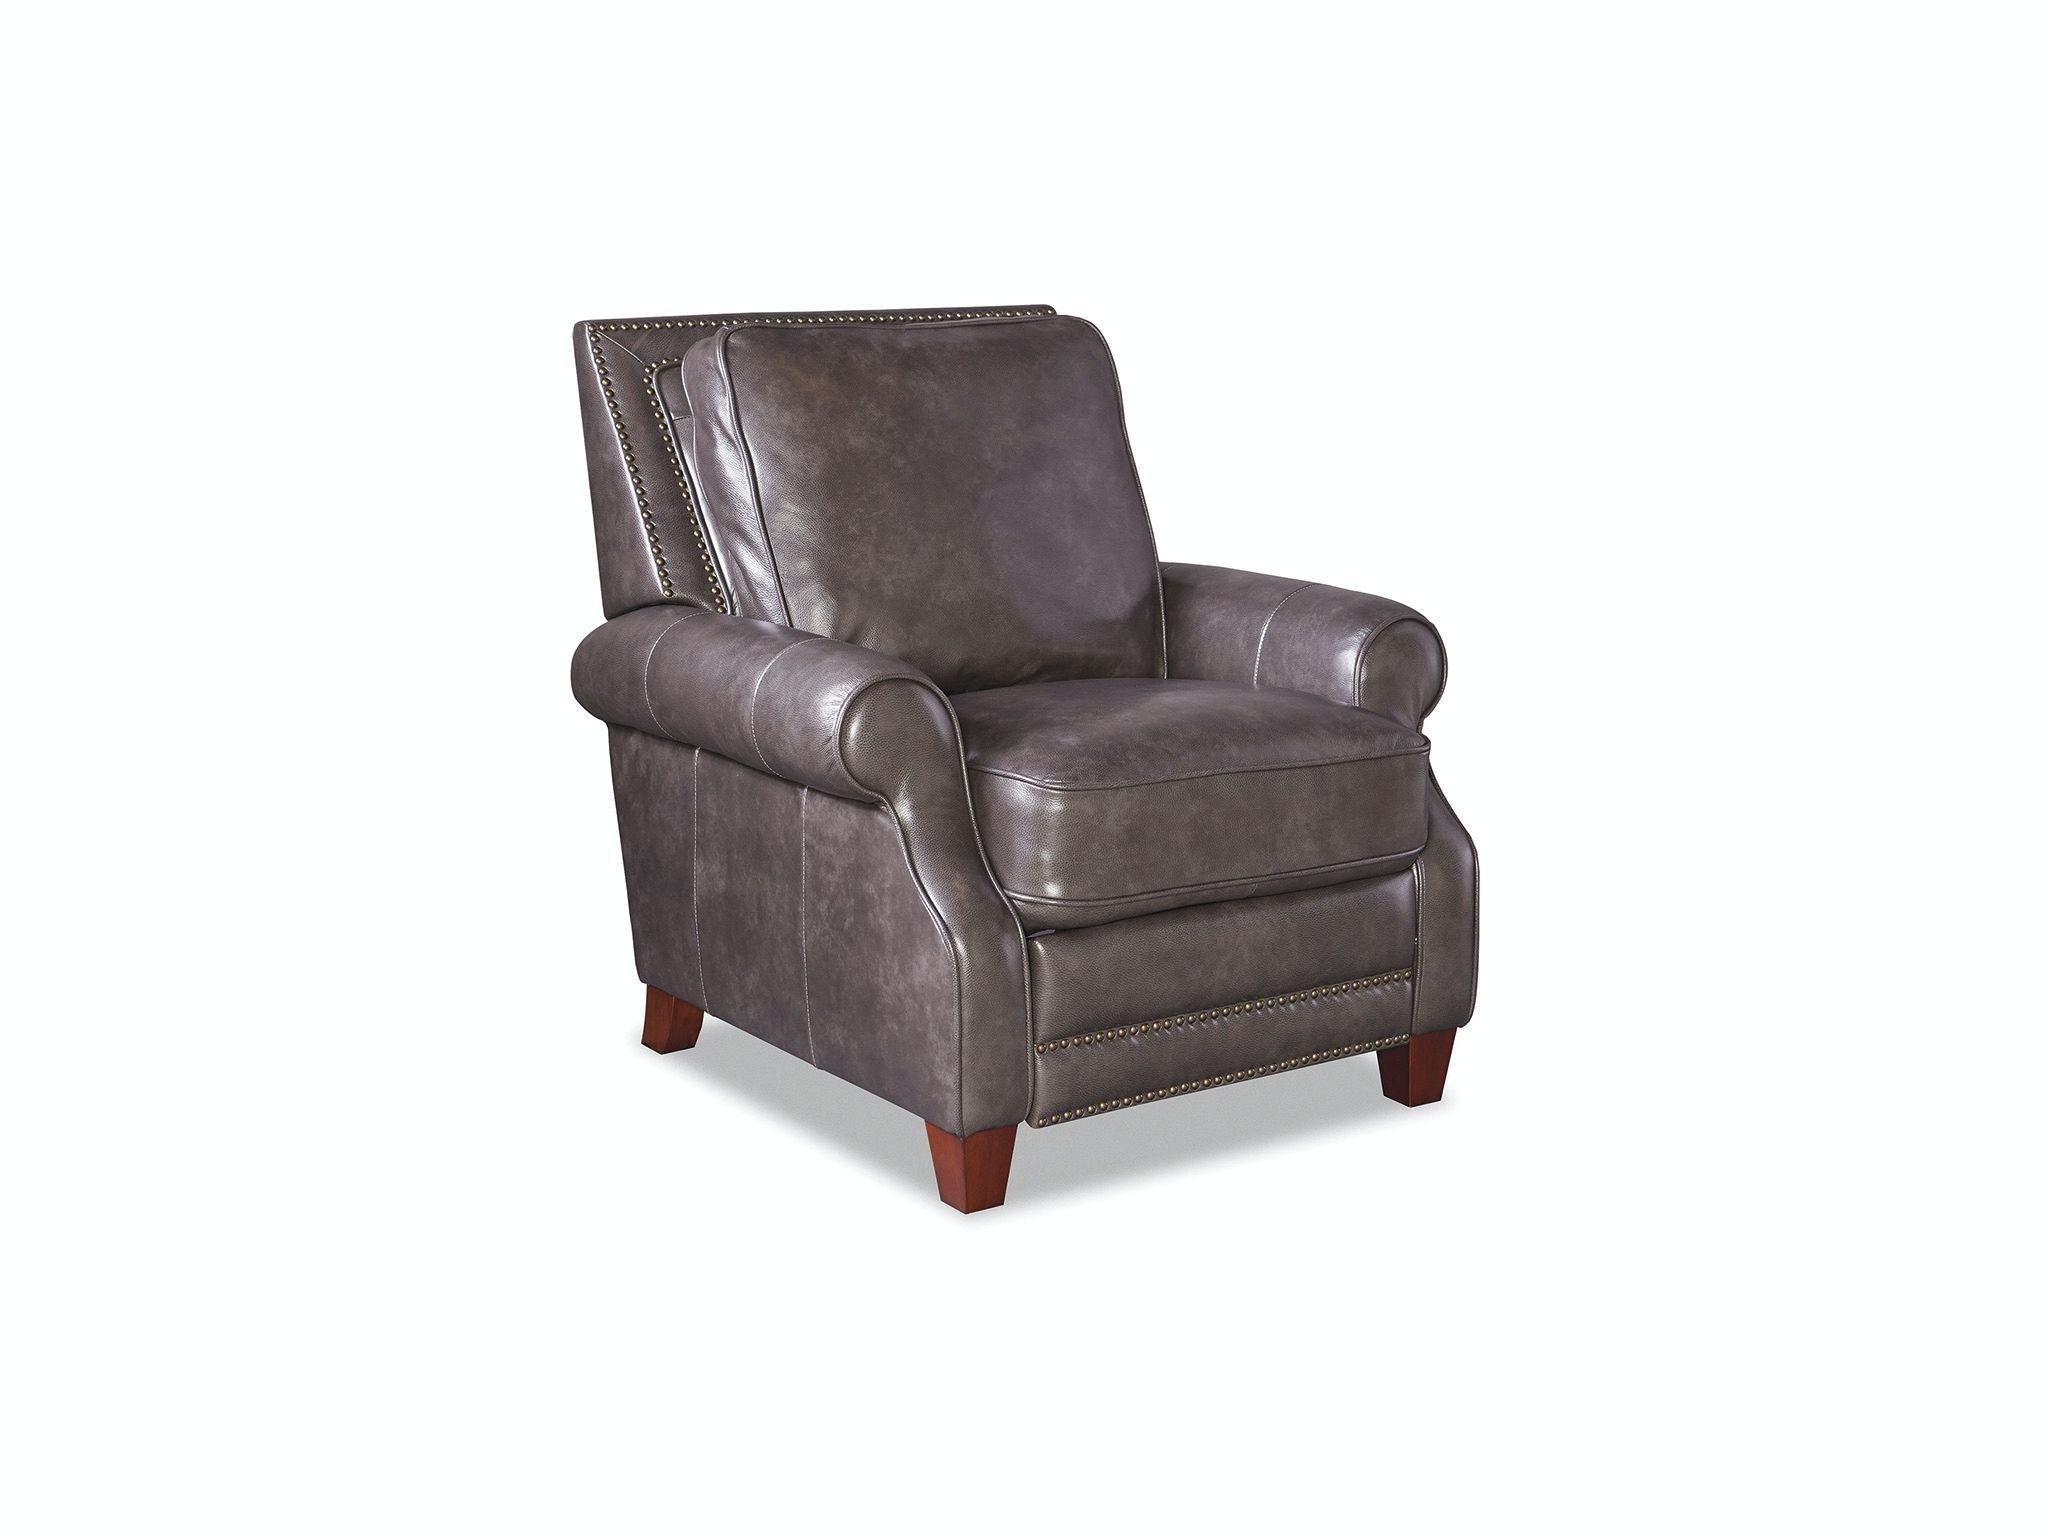 Craftmaster Living Room Recliner L064010 At Indiana Furniture And Mattress